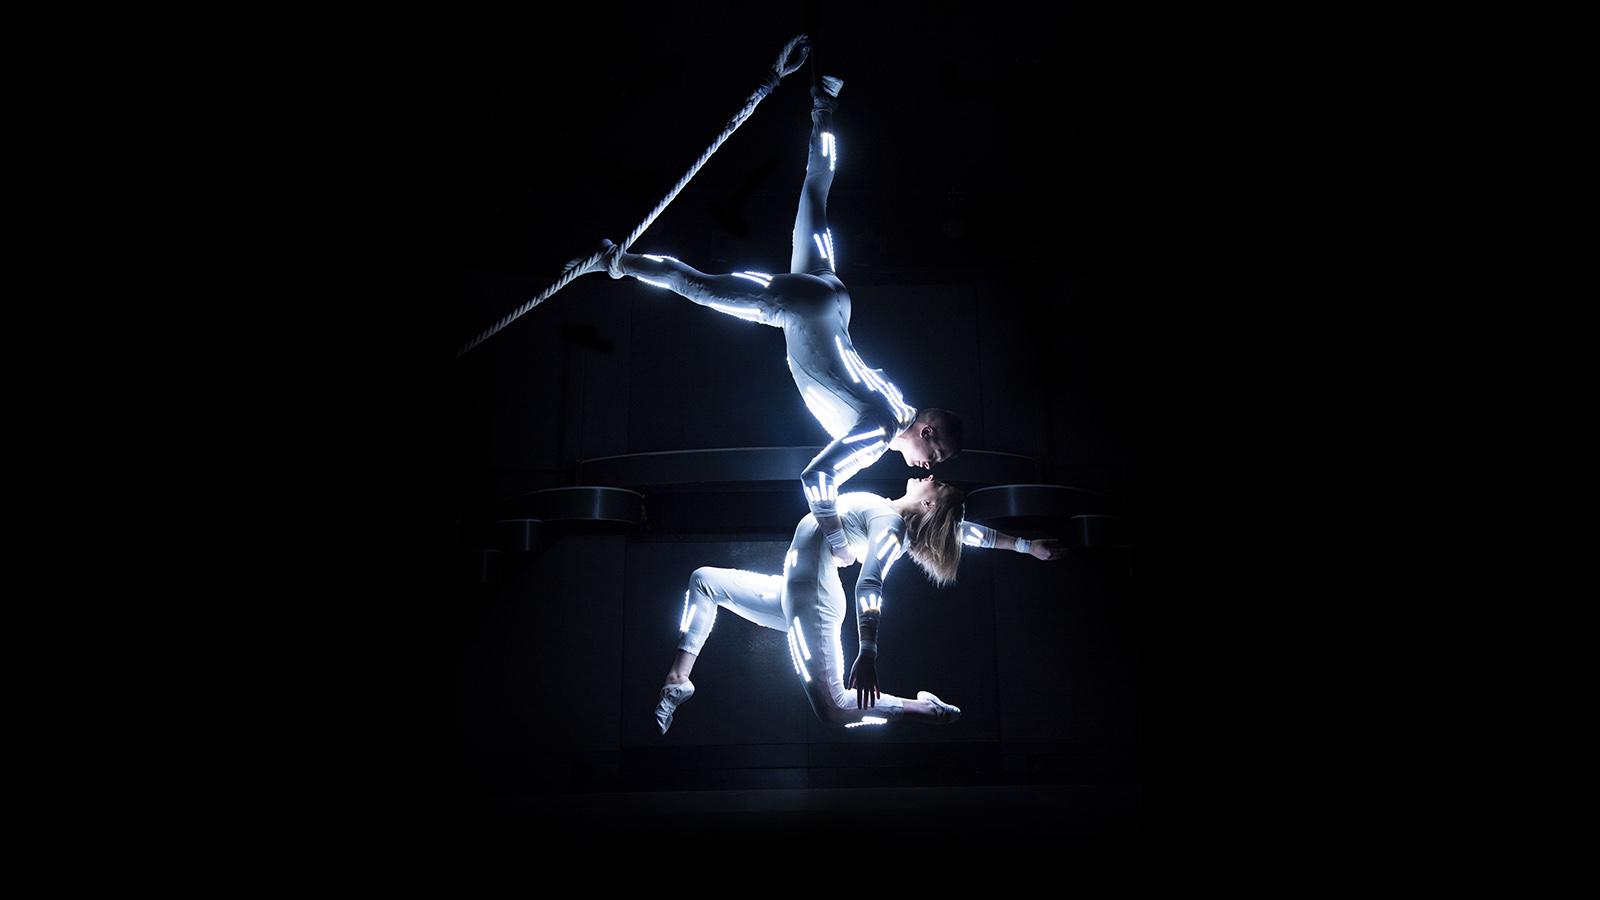 LED Aerial dancers